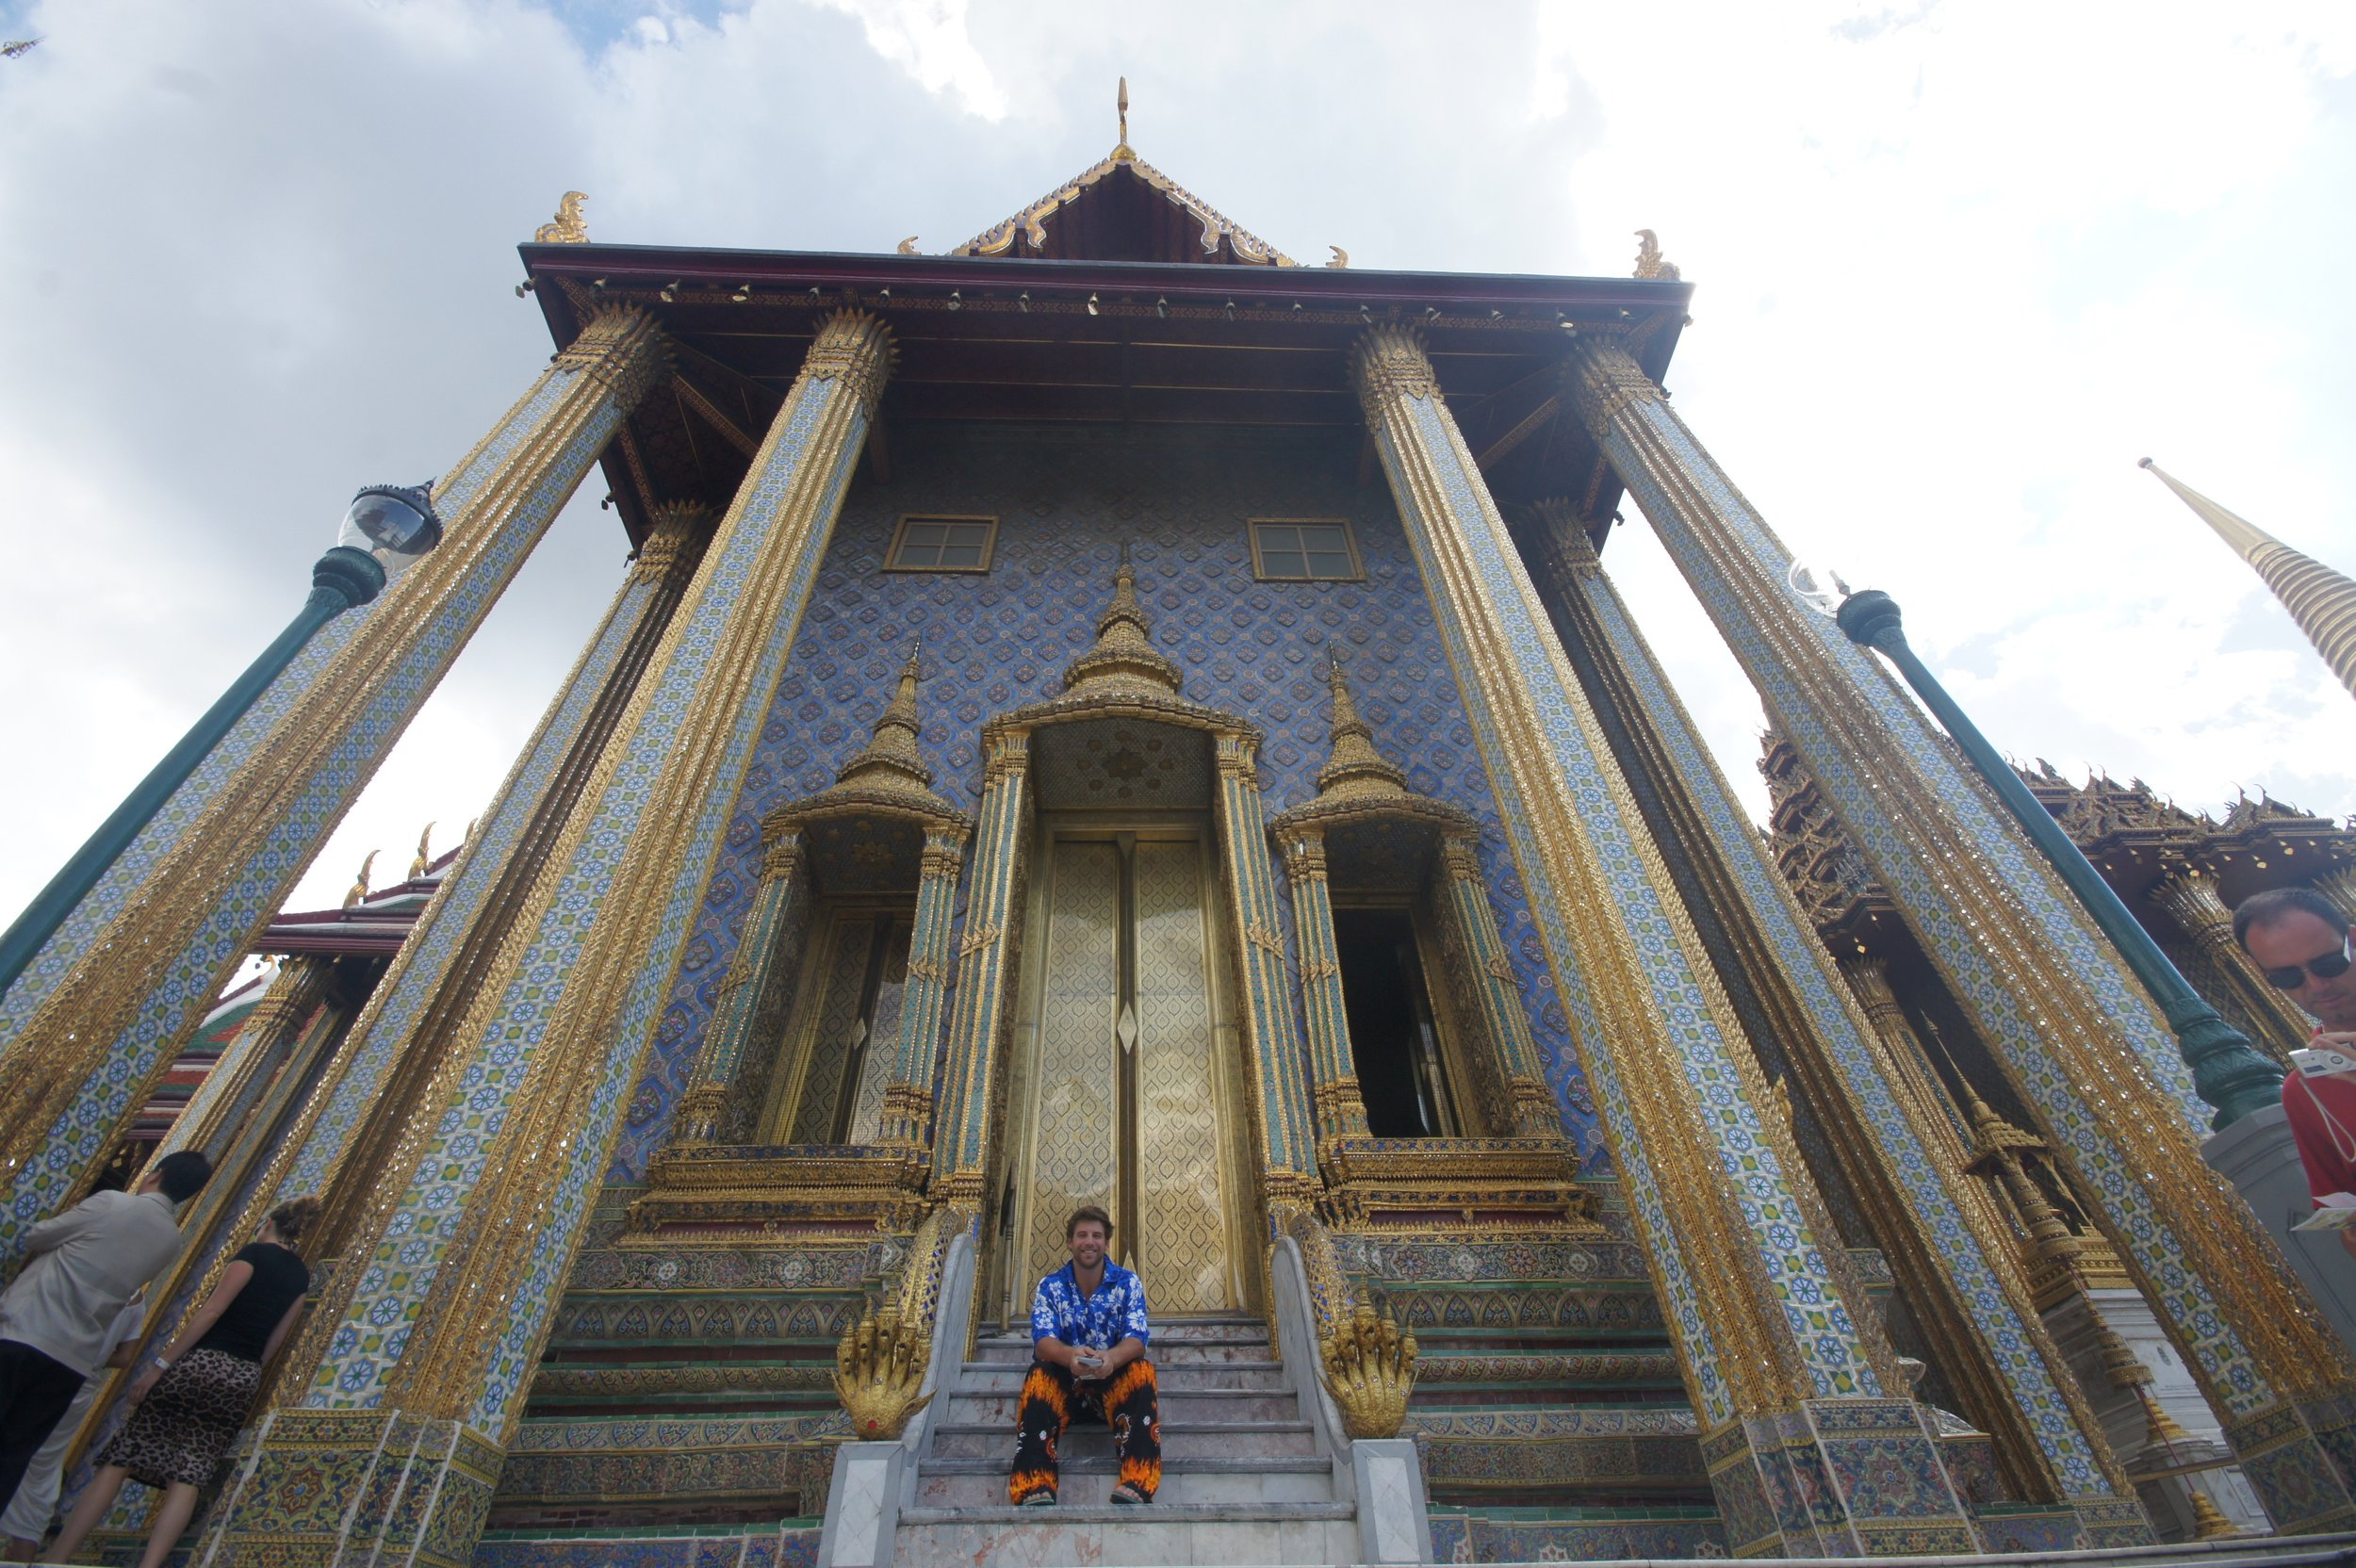 Visiting the Grand Palace and Temple of the Emerald Buddha Bangkok Thailand